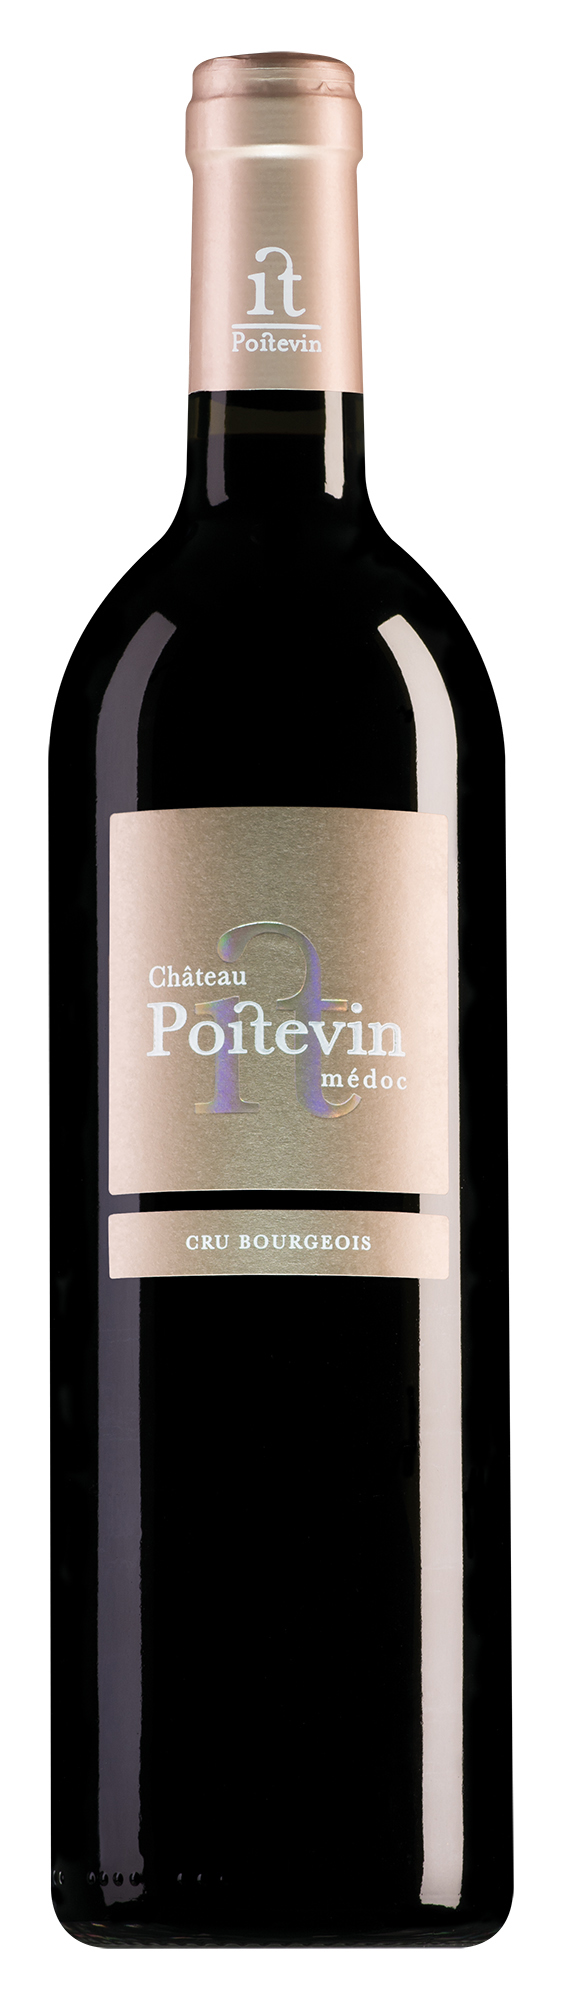 Château Poitevin Médoc Cru Bourgeois